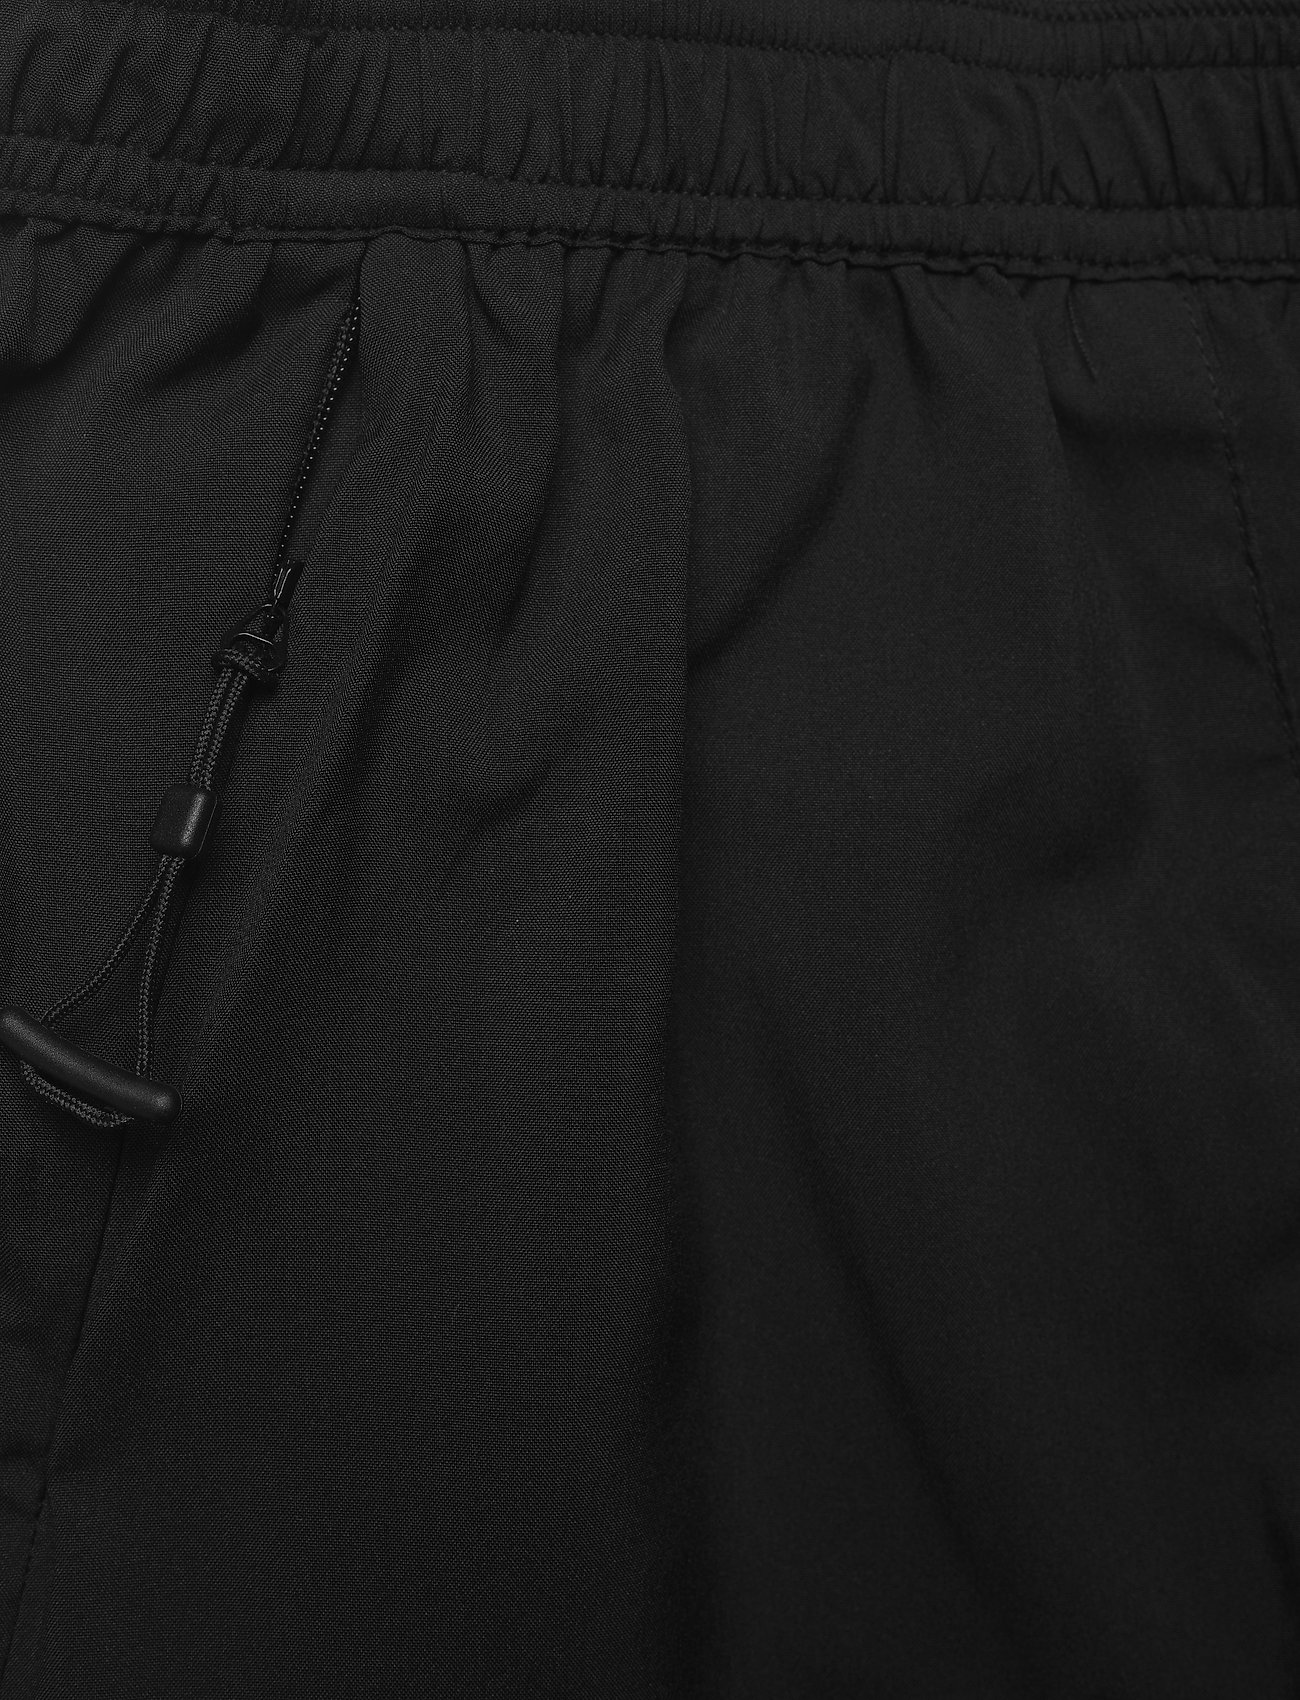 Soulland - Harley shorts - krótkie spodenki - black - 4